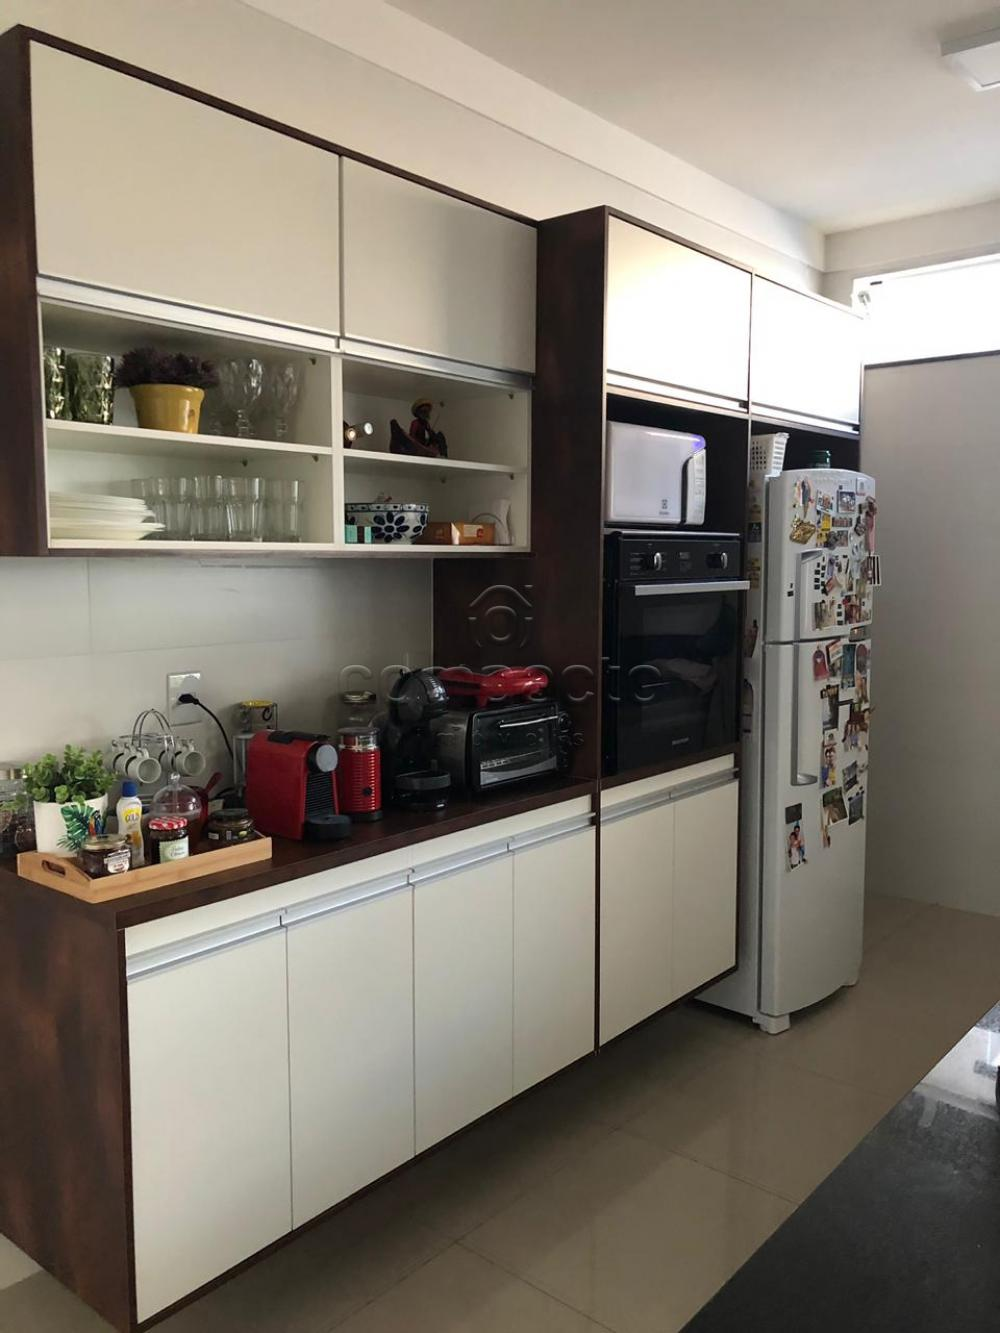 Comprar Casa / Condomínio em Bauru apenas R$ 850.000,00 - Foto 17